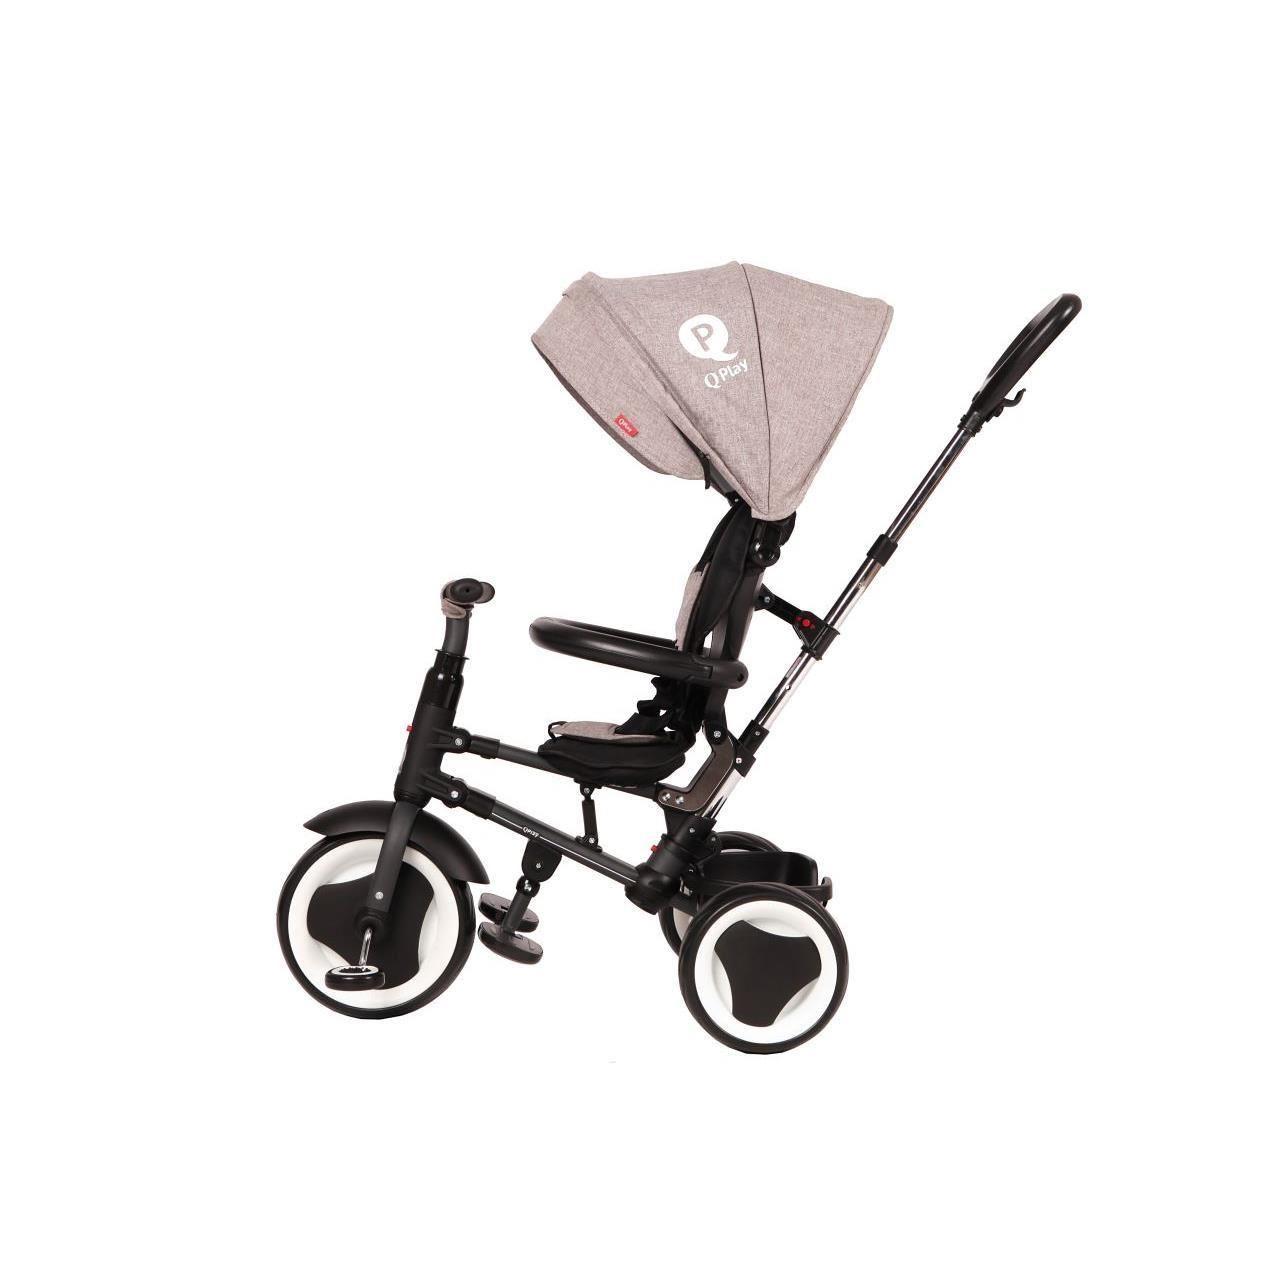 Tricicleta Pliabila Pentru Copii Qplay Rito Albastru Inchis [11]